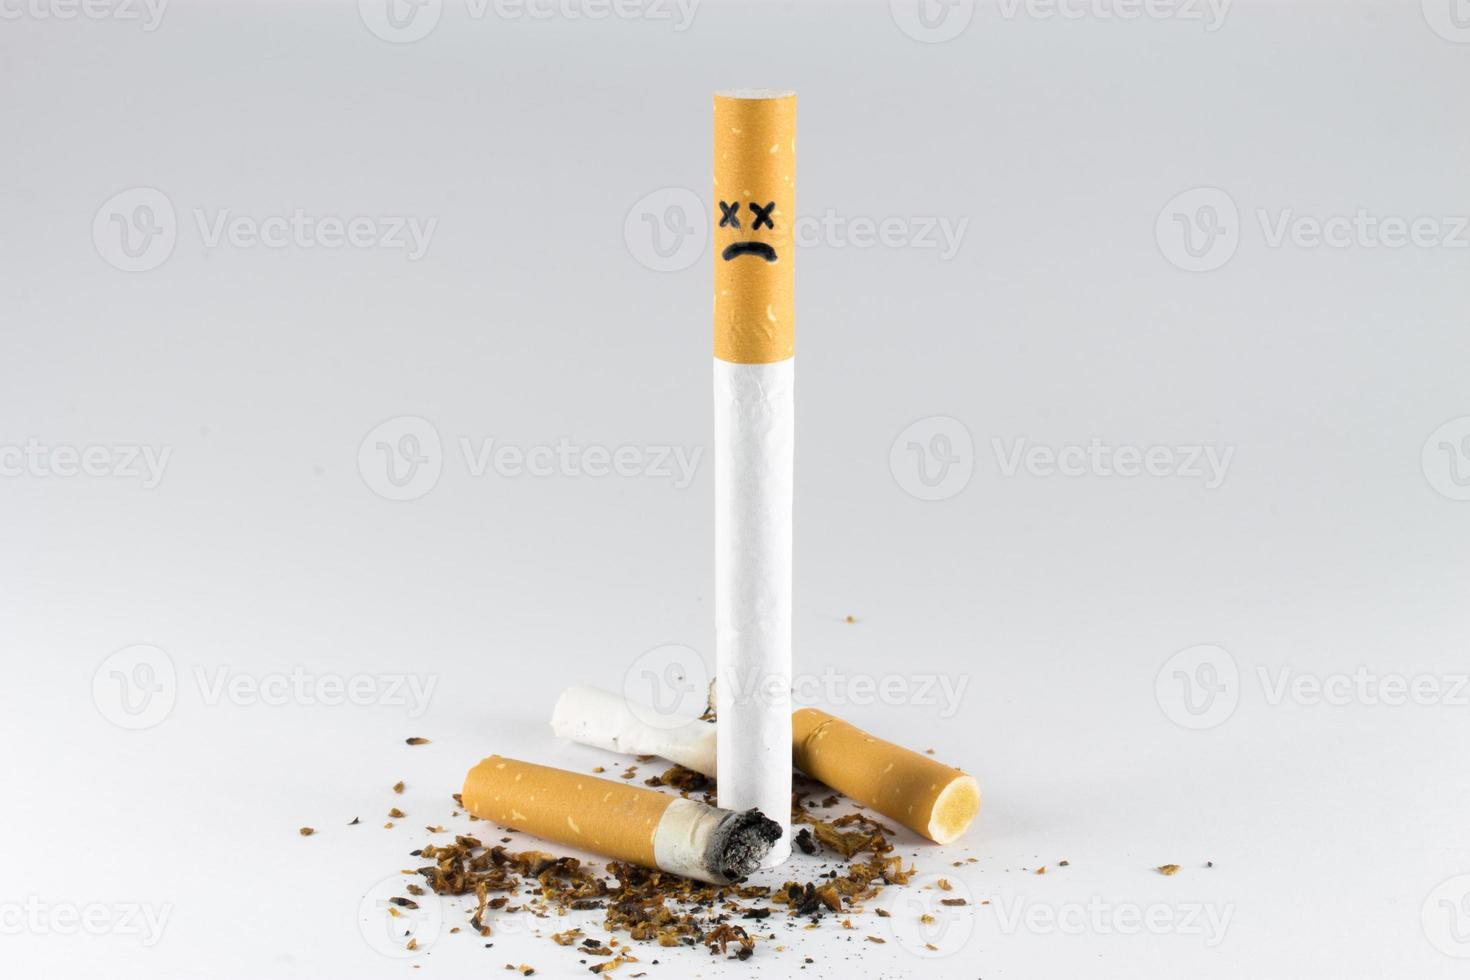 Zigarettenkreuz Gesicht foto